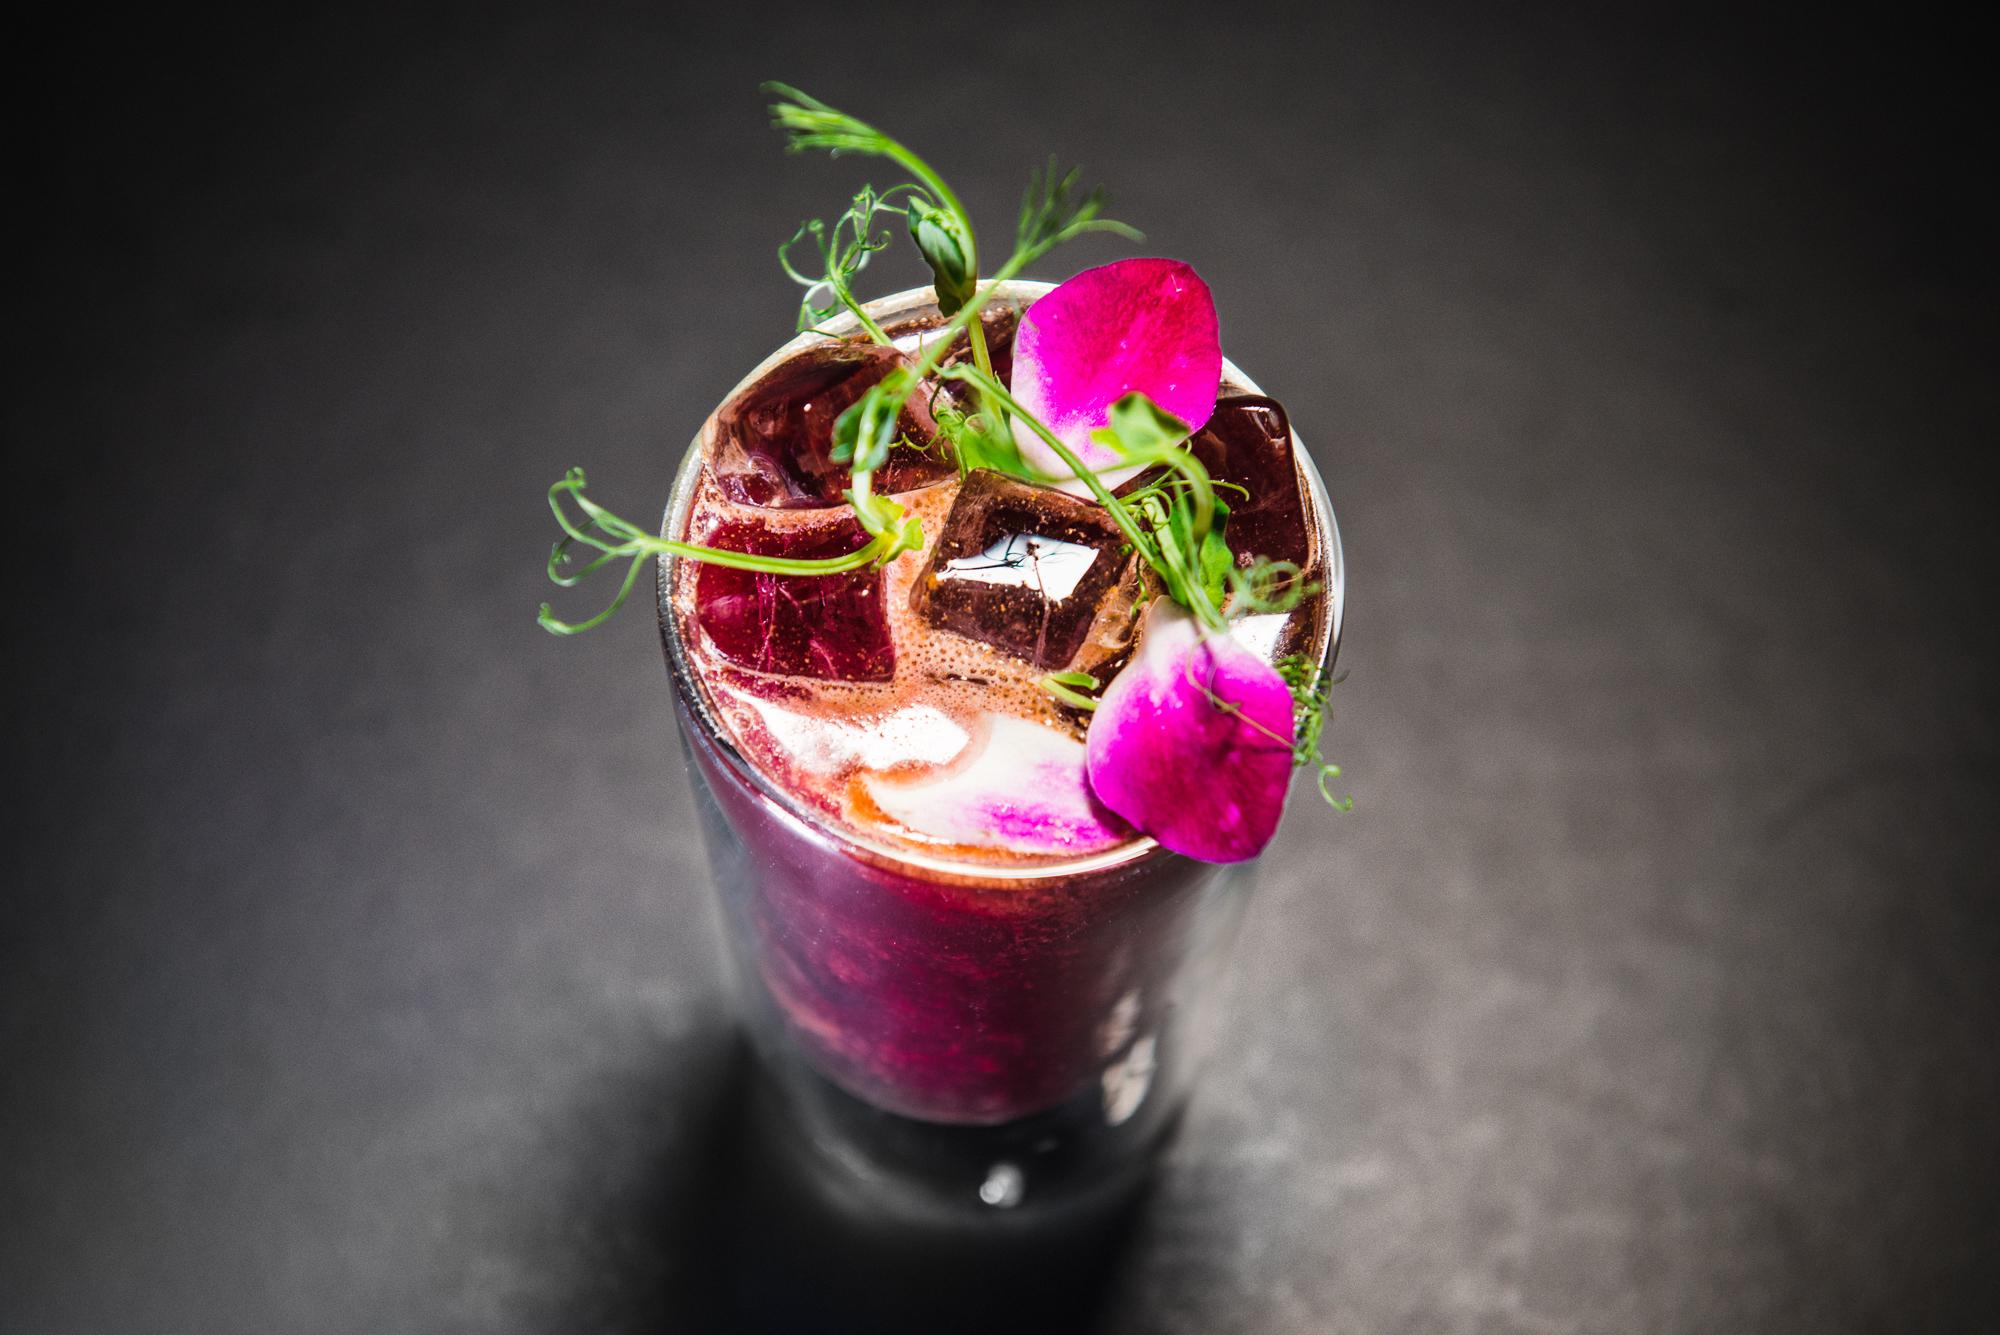 Shiki Detox Cocktail